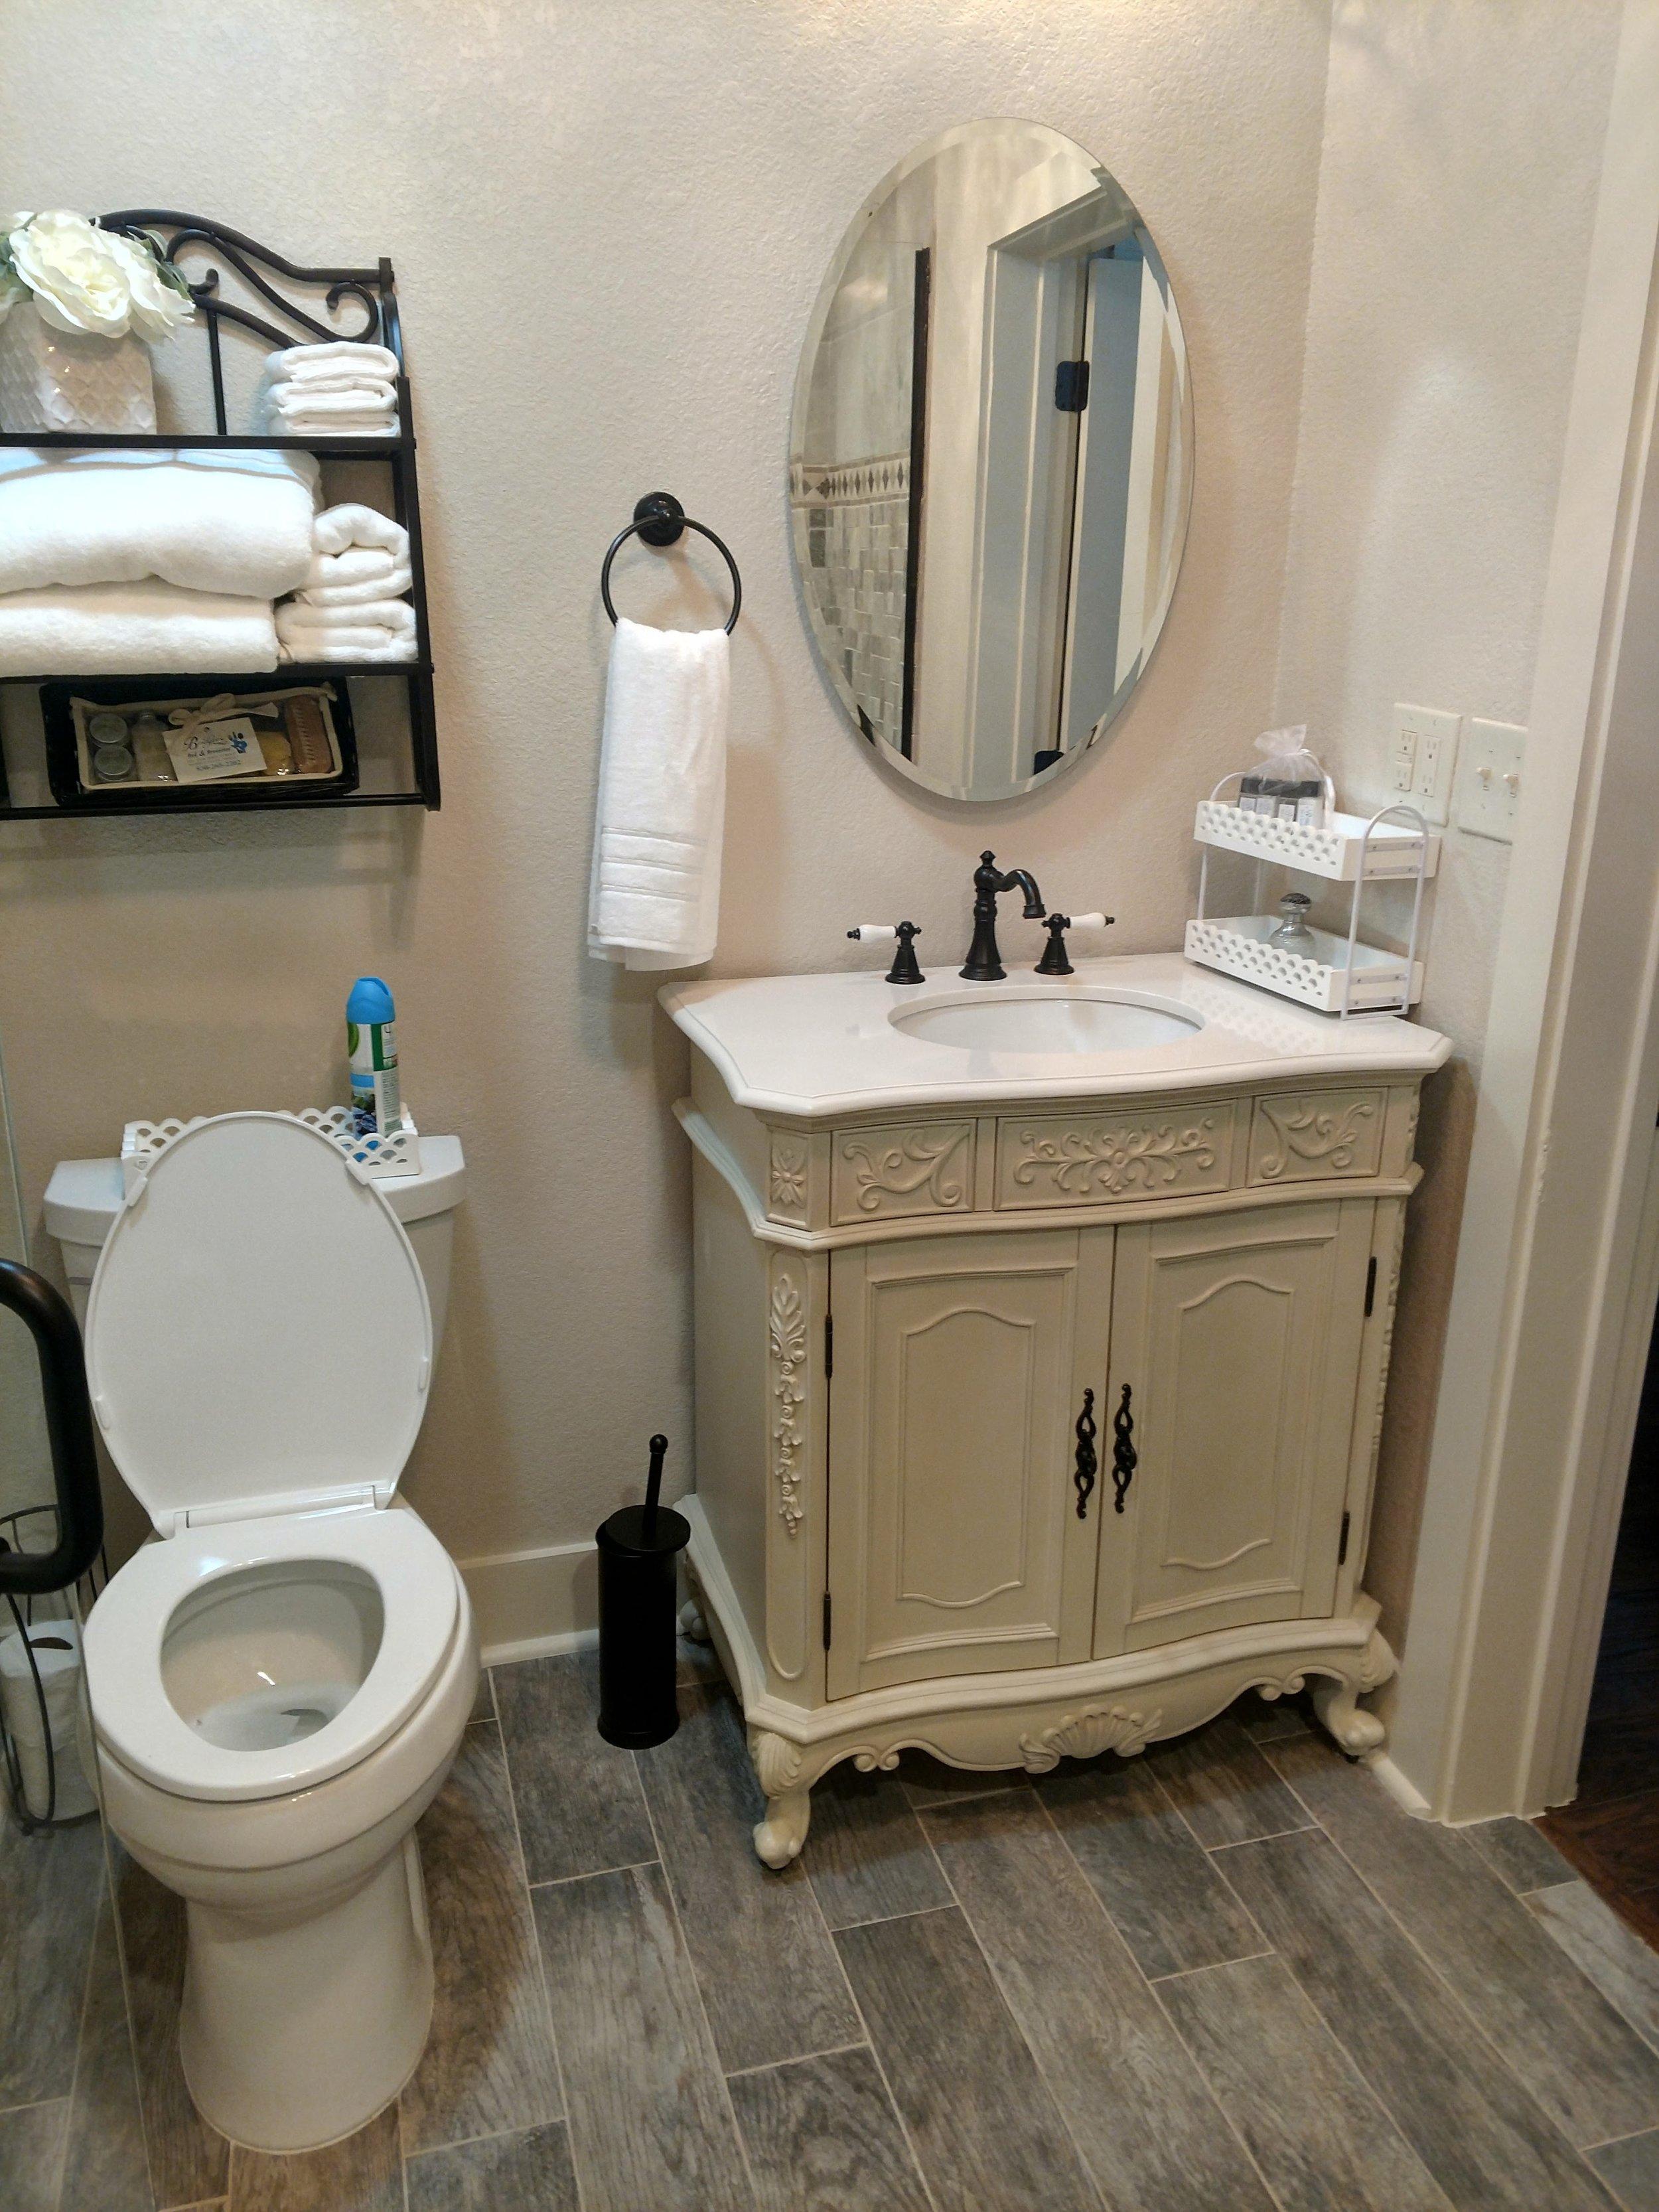 Big House_Bathroom king A stool and vanity.jpg